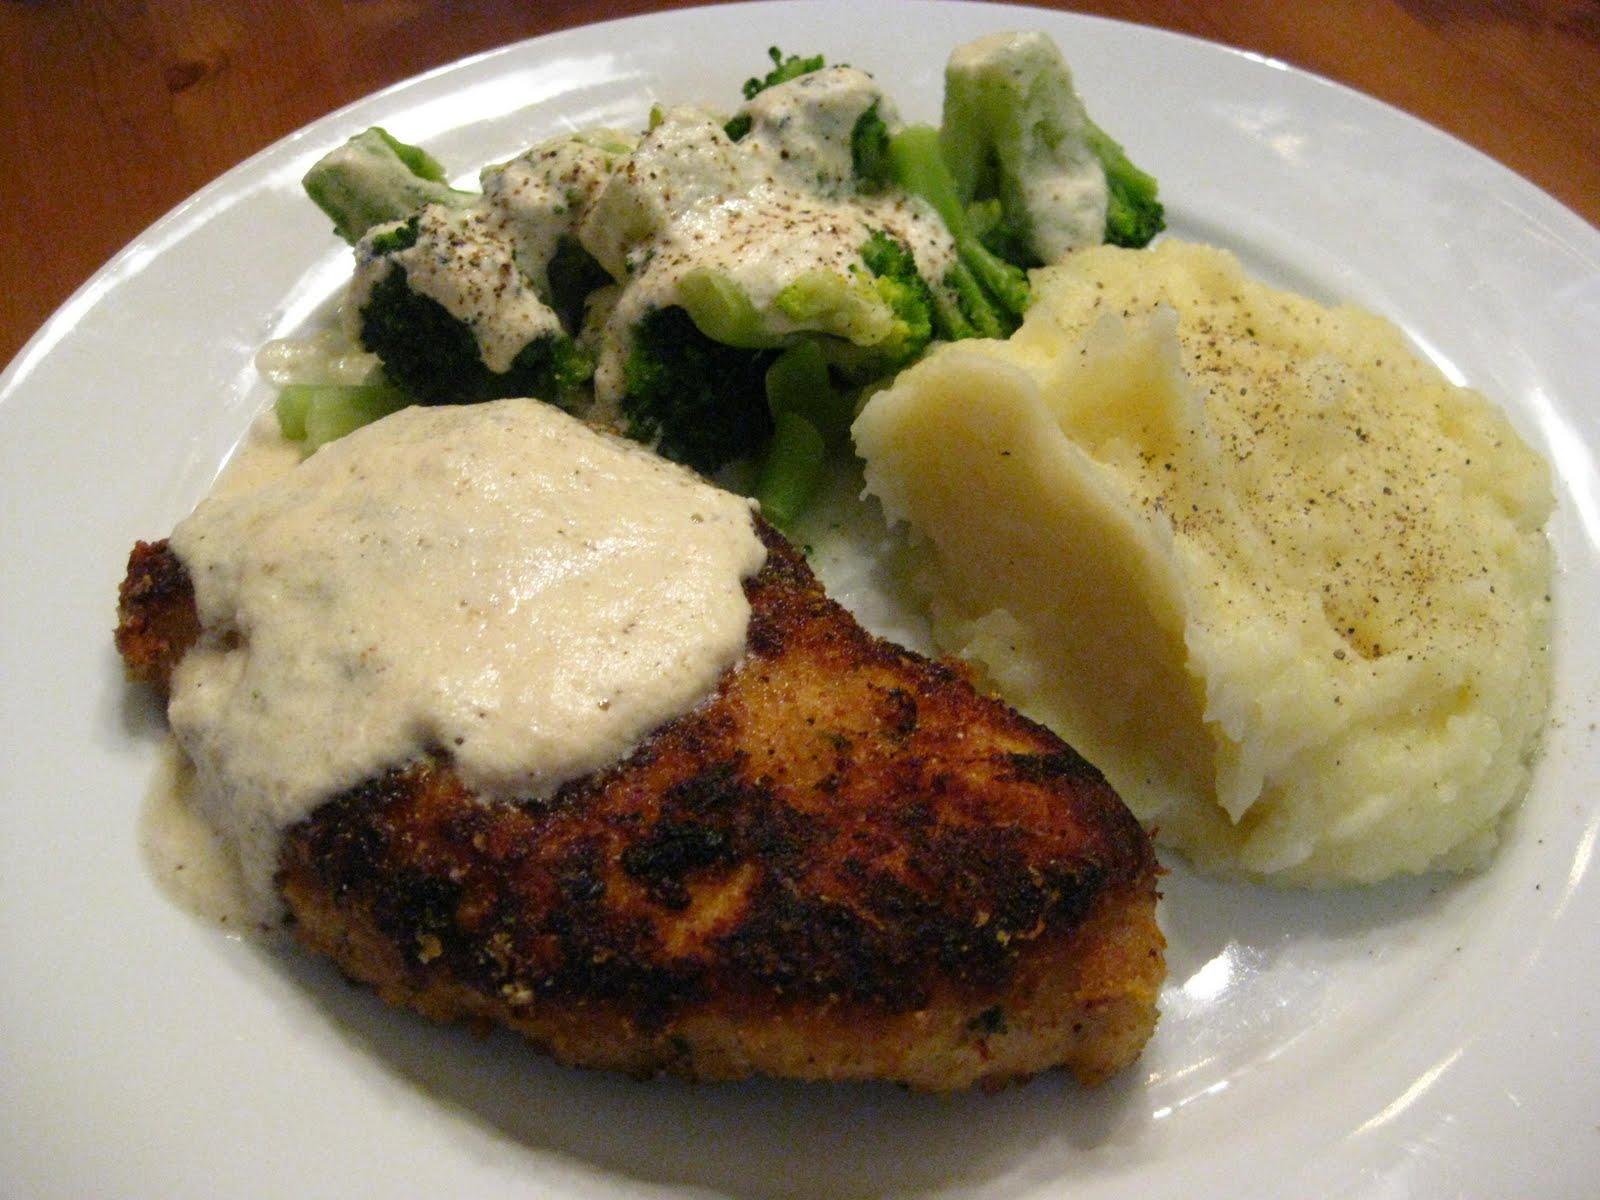 Chicken Broccoli Mashed Potato Casserole